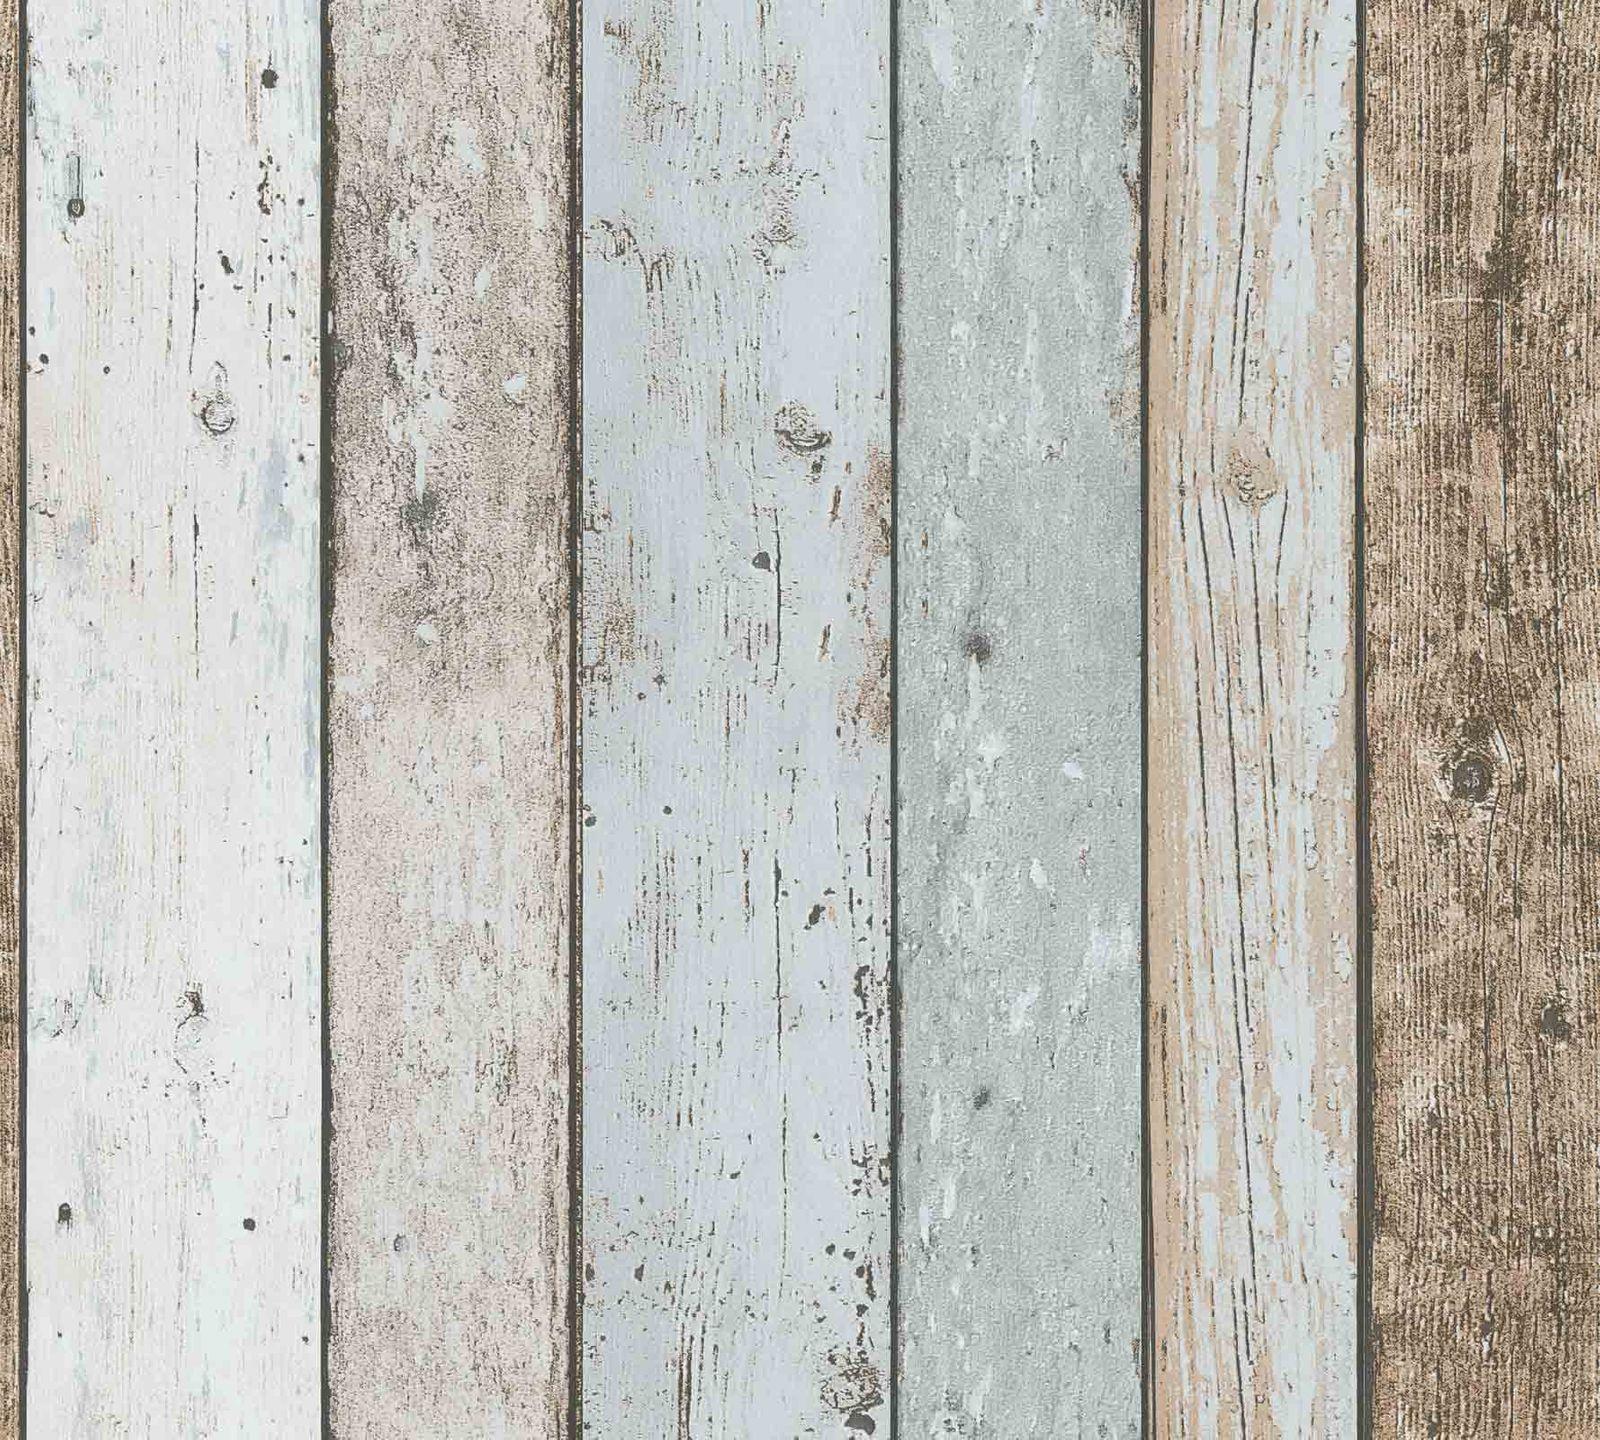 Wallpaper Wood Panel Vintage Cream Blue Brown 8999 27